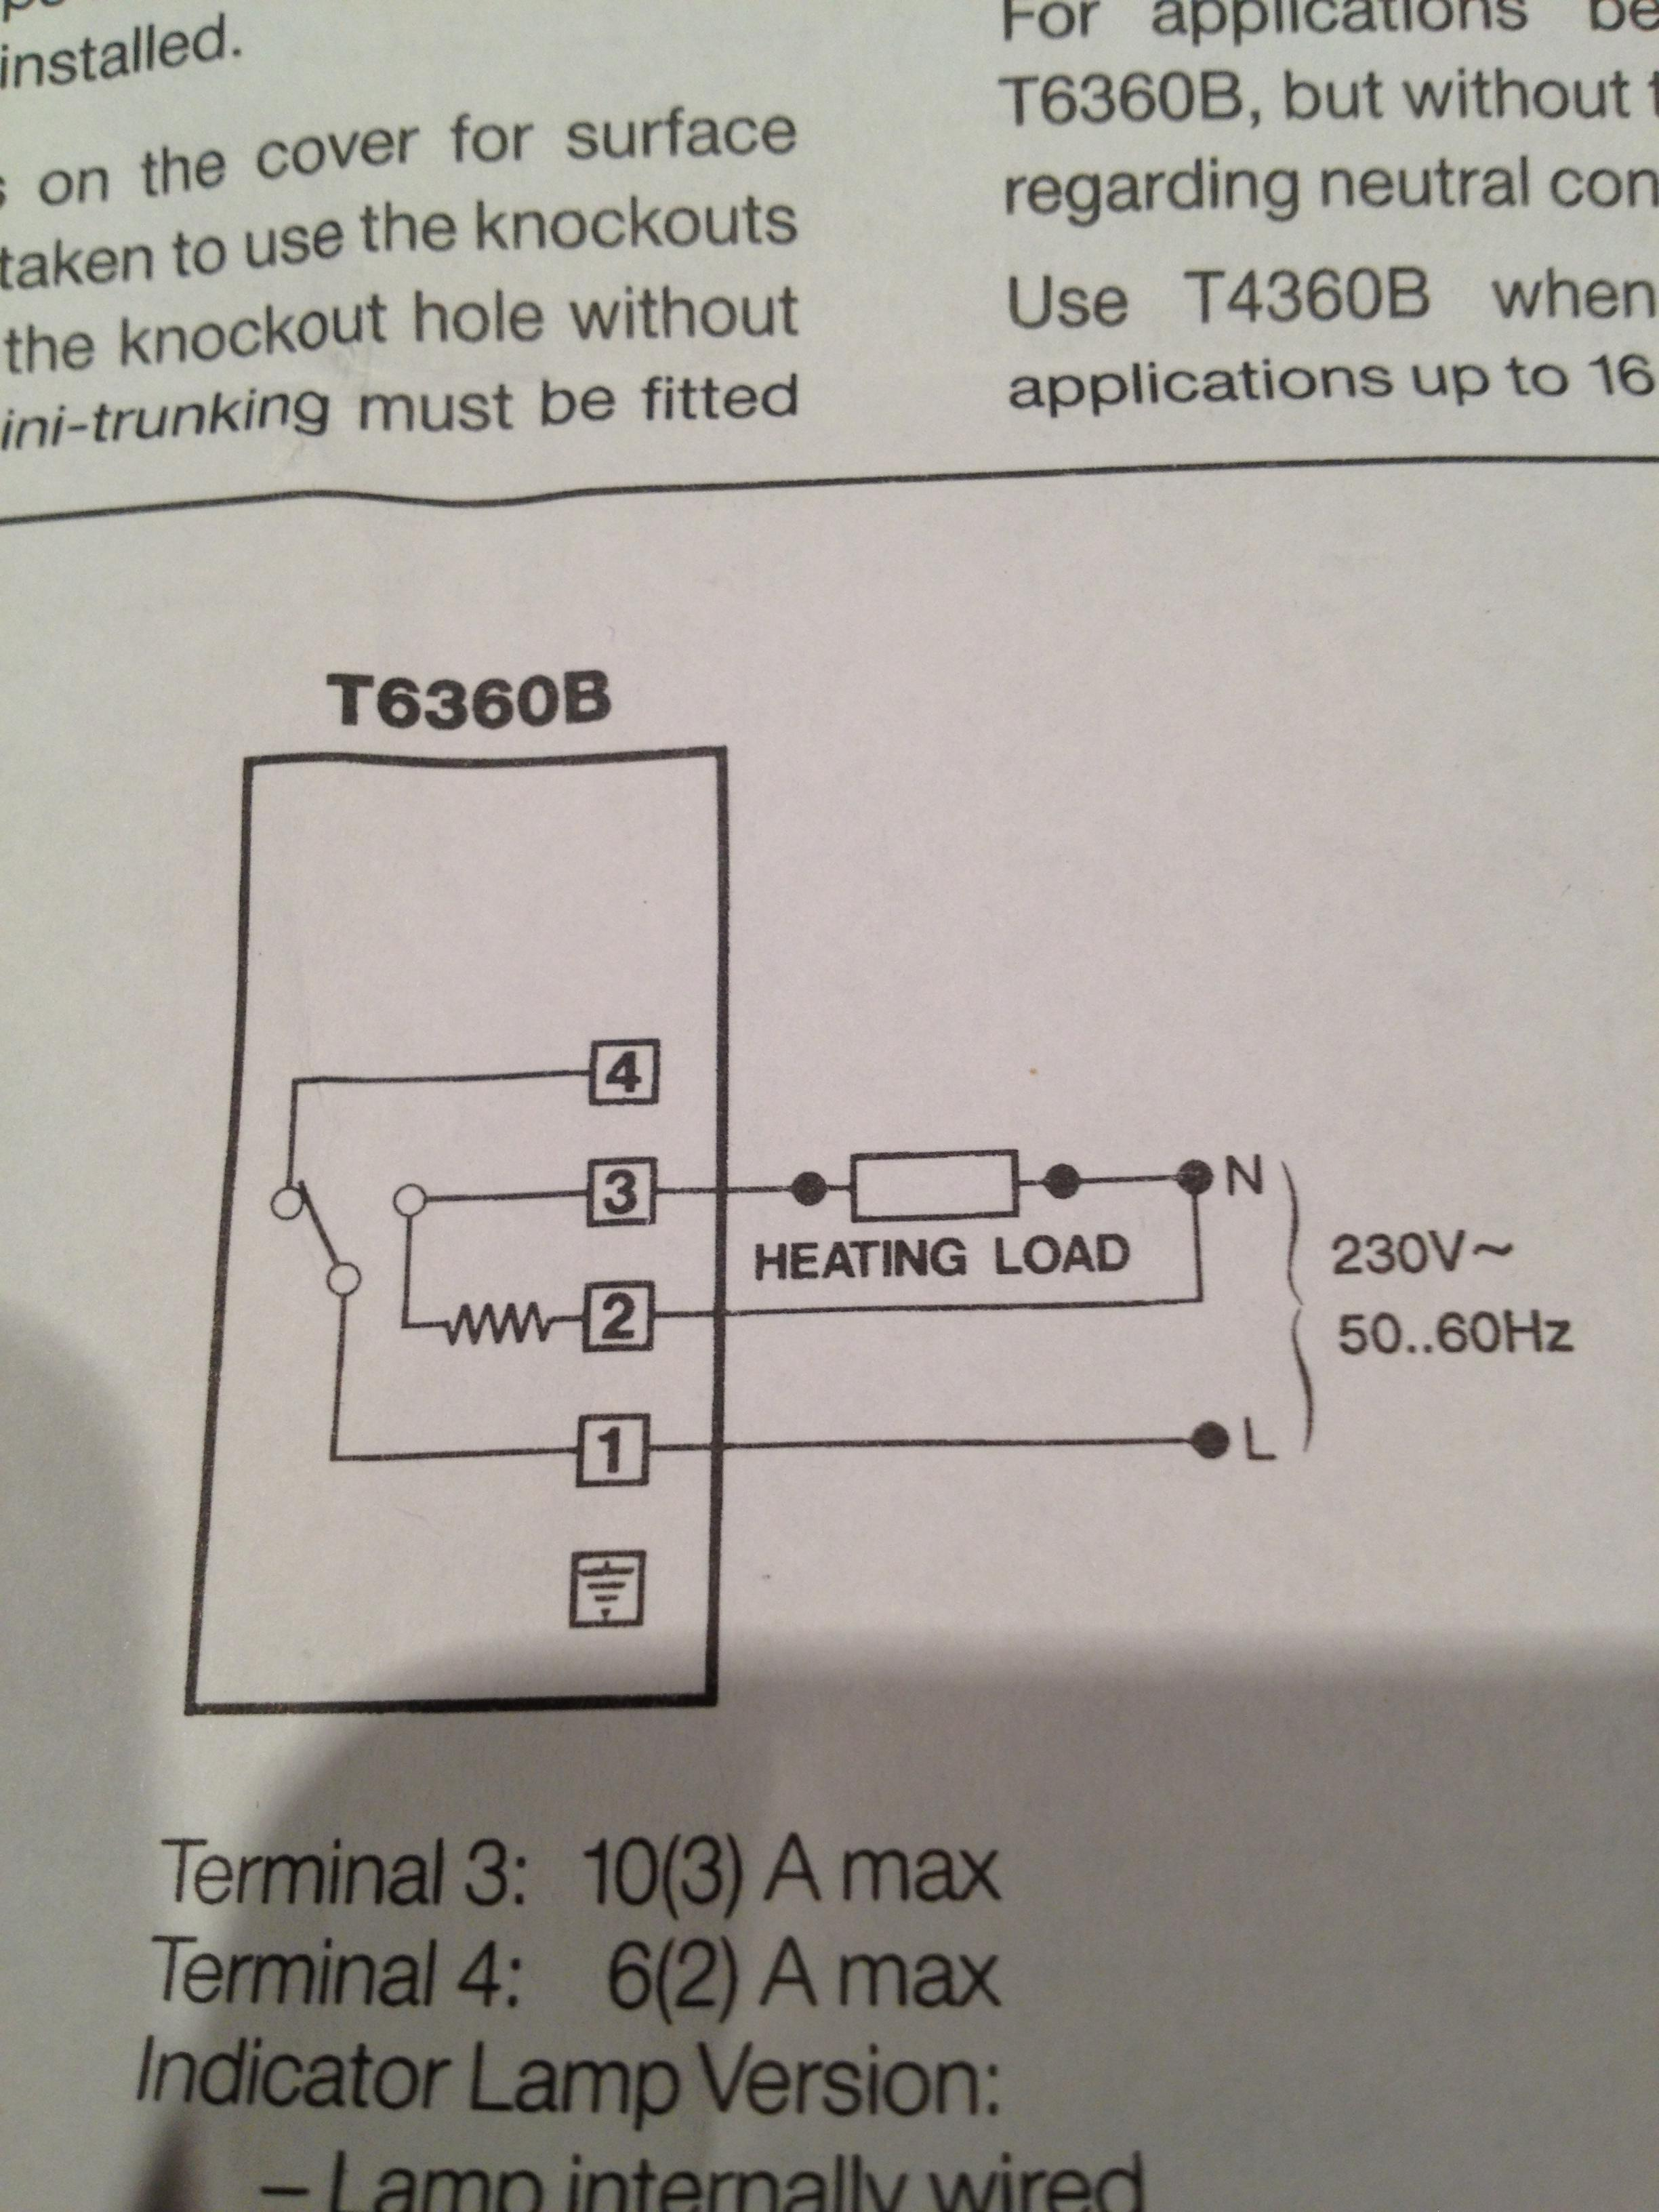 room thermostat wiring diagram honeywell atoll reef t6360 follow installation